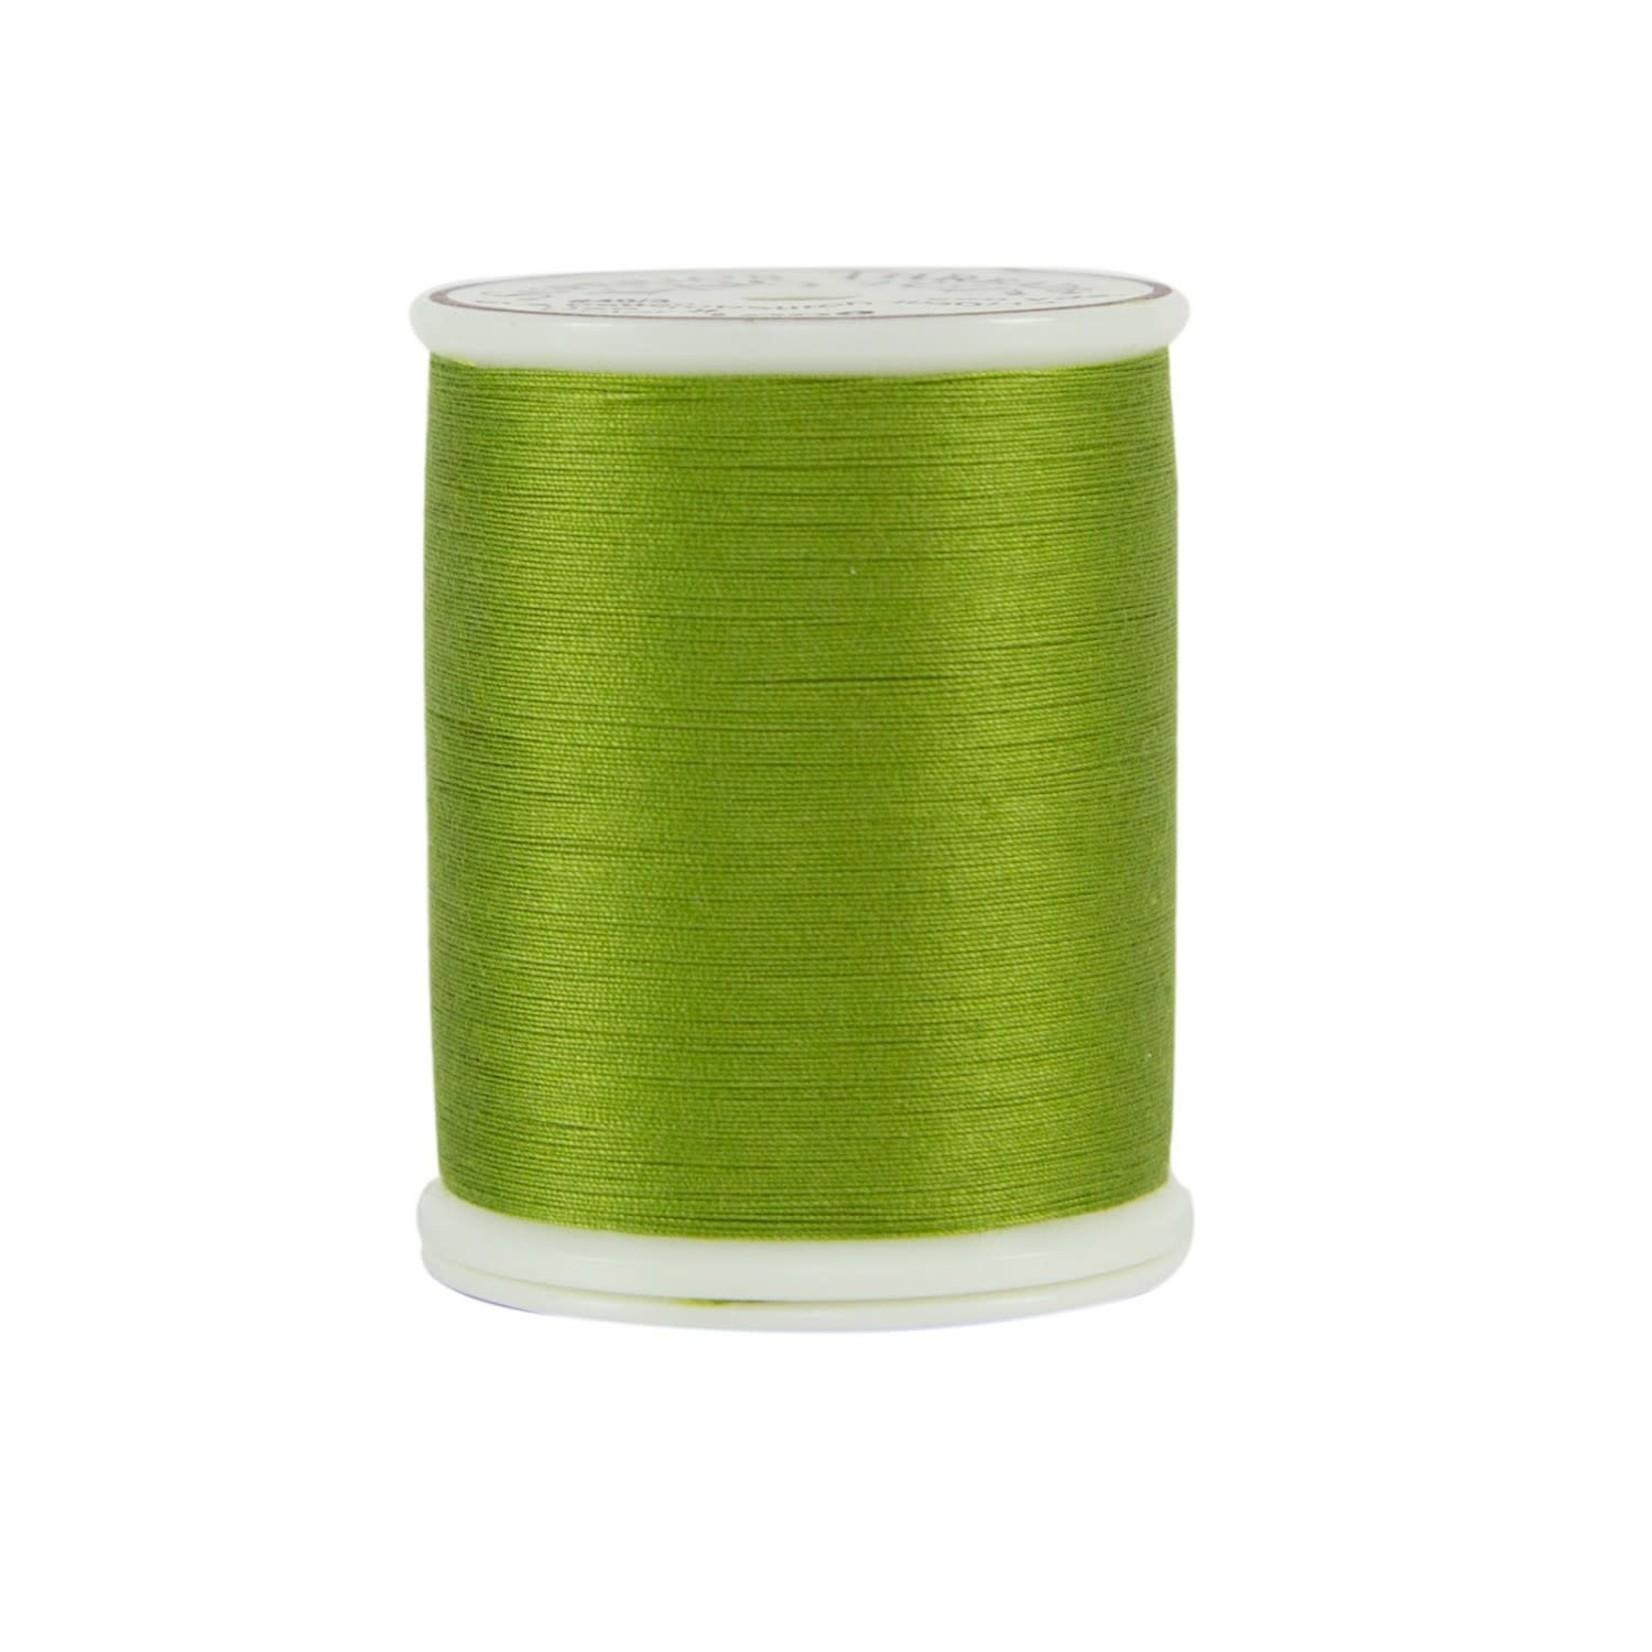 Superior Threads King Tut - #40 - 457 m - 1009 Jalapeno